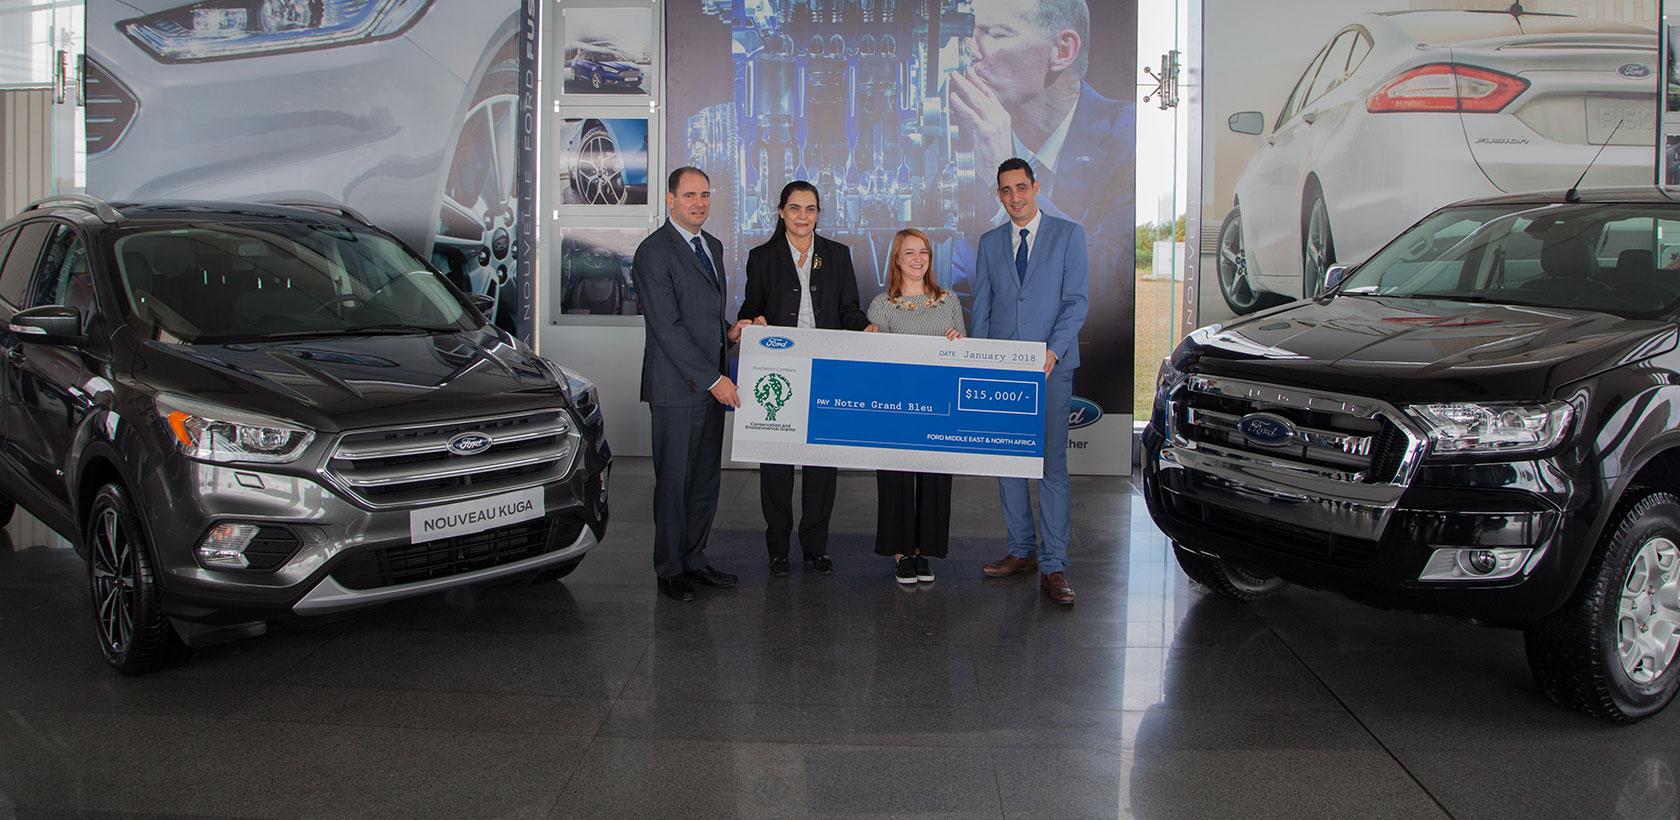 Ford Motor Company accorde un prix de 15,000 dollars à un projet environnemental en Tunisie